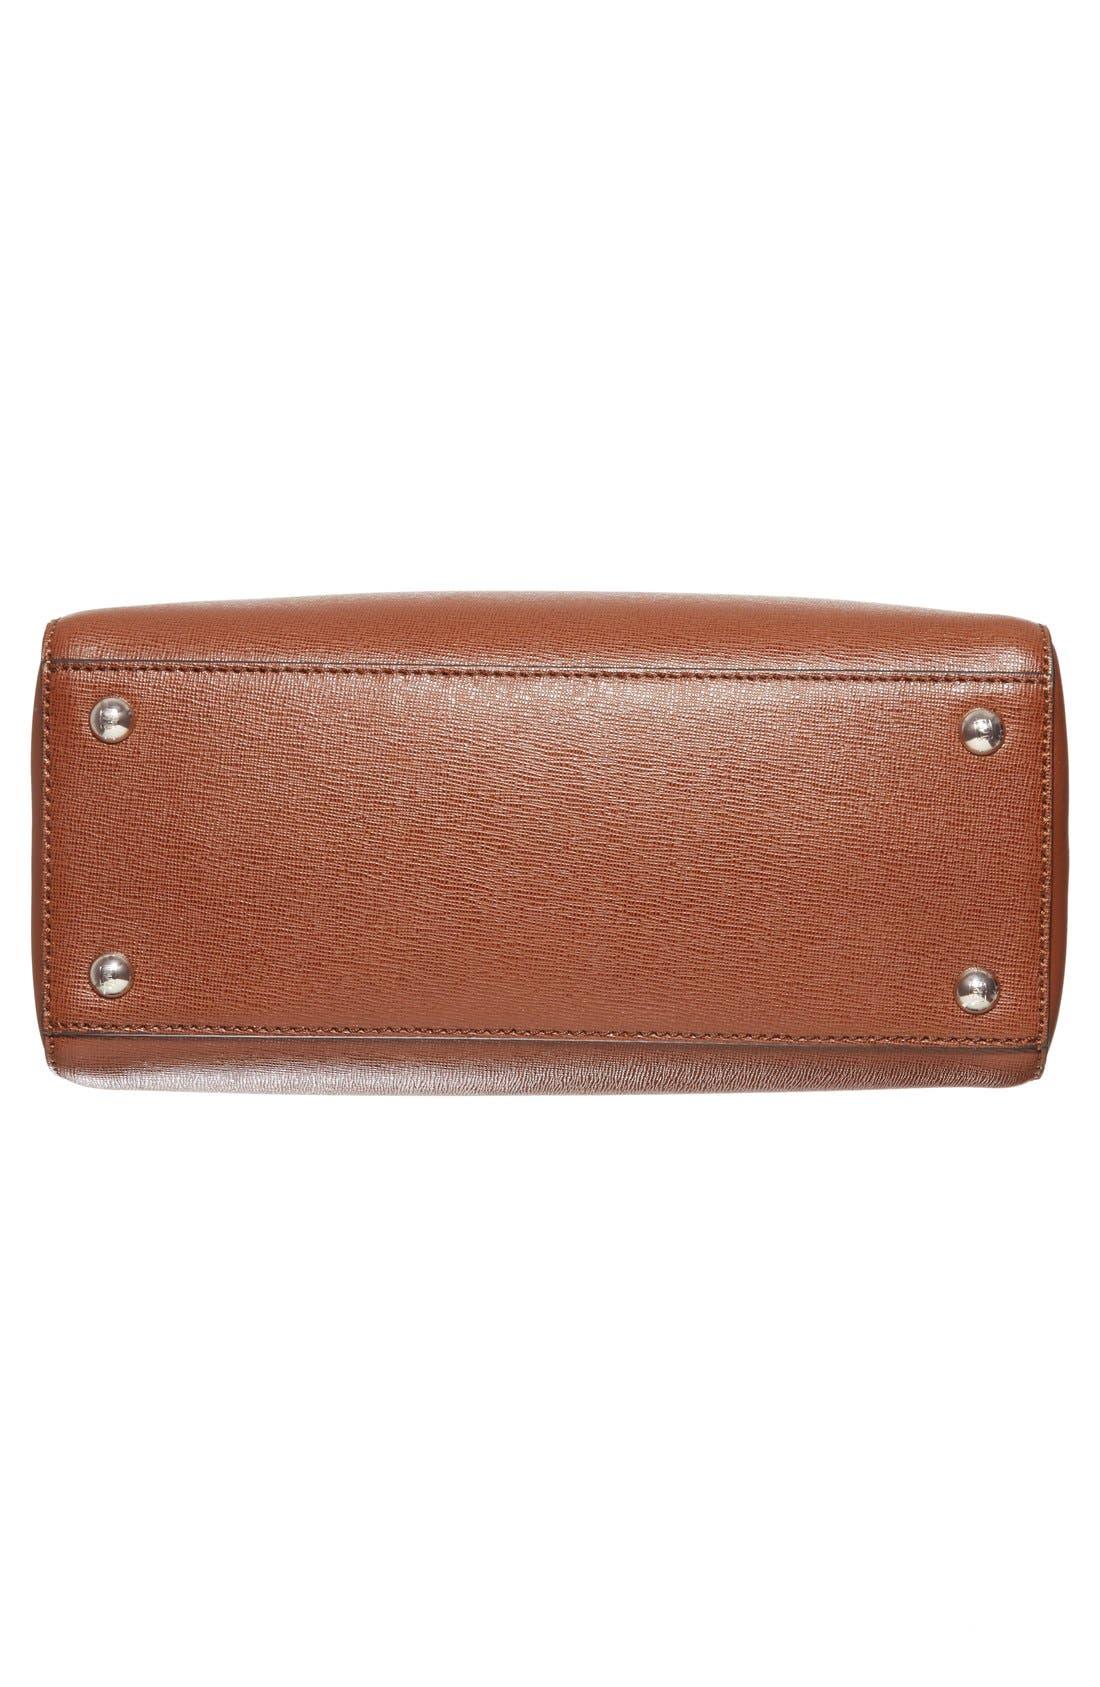 'Petite 2Jours Elite' Leather Shopper,                             Alternate thumbnail 127, color,